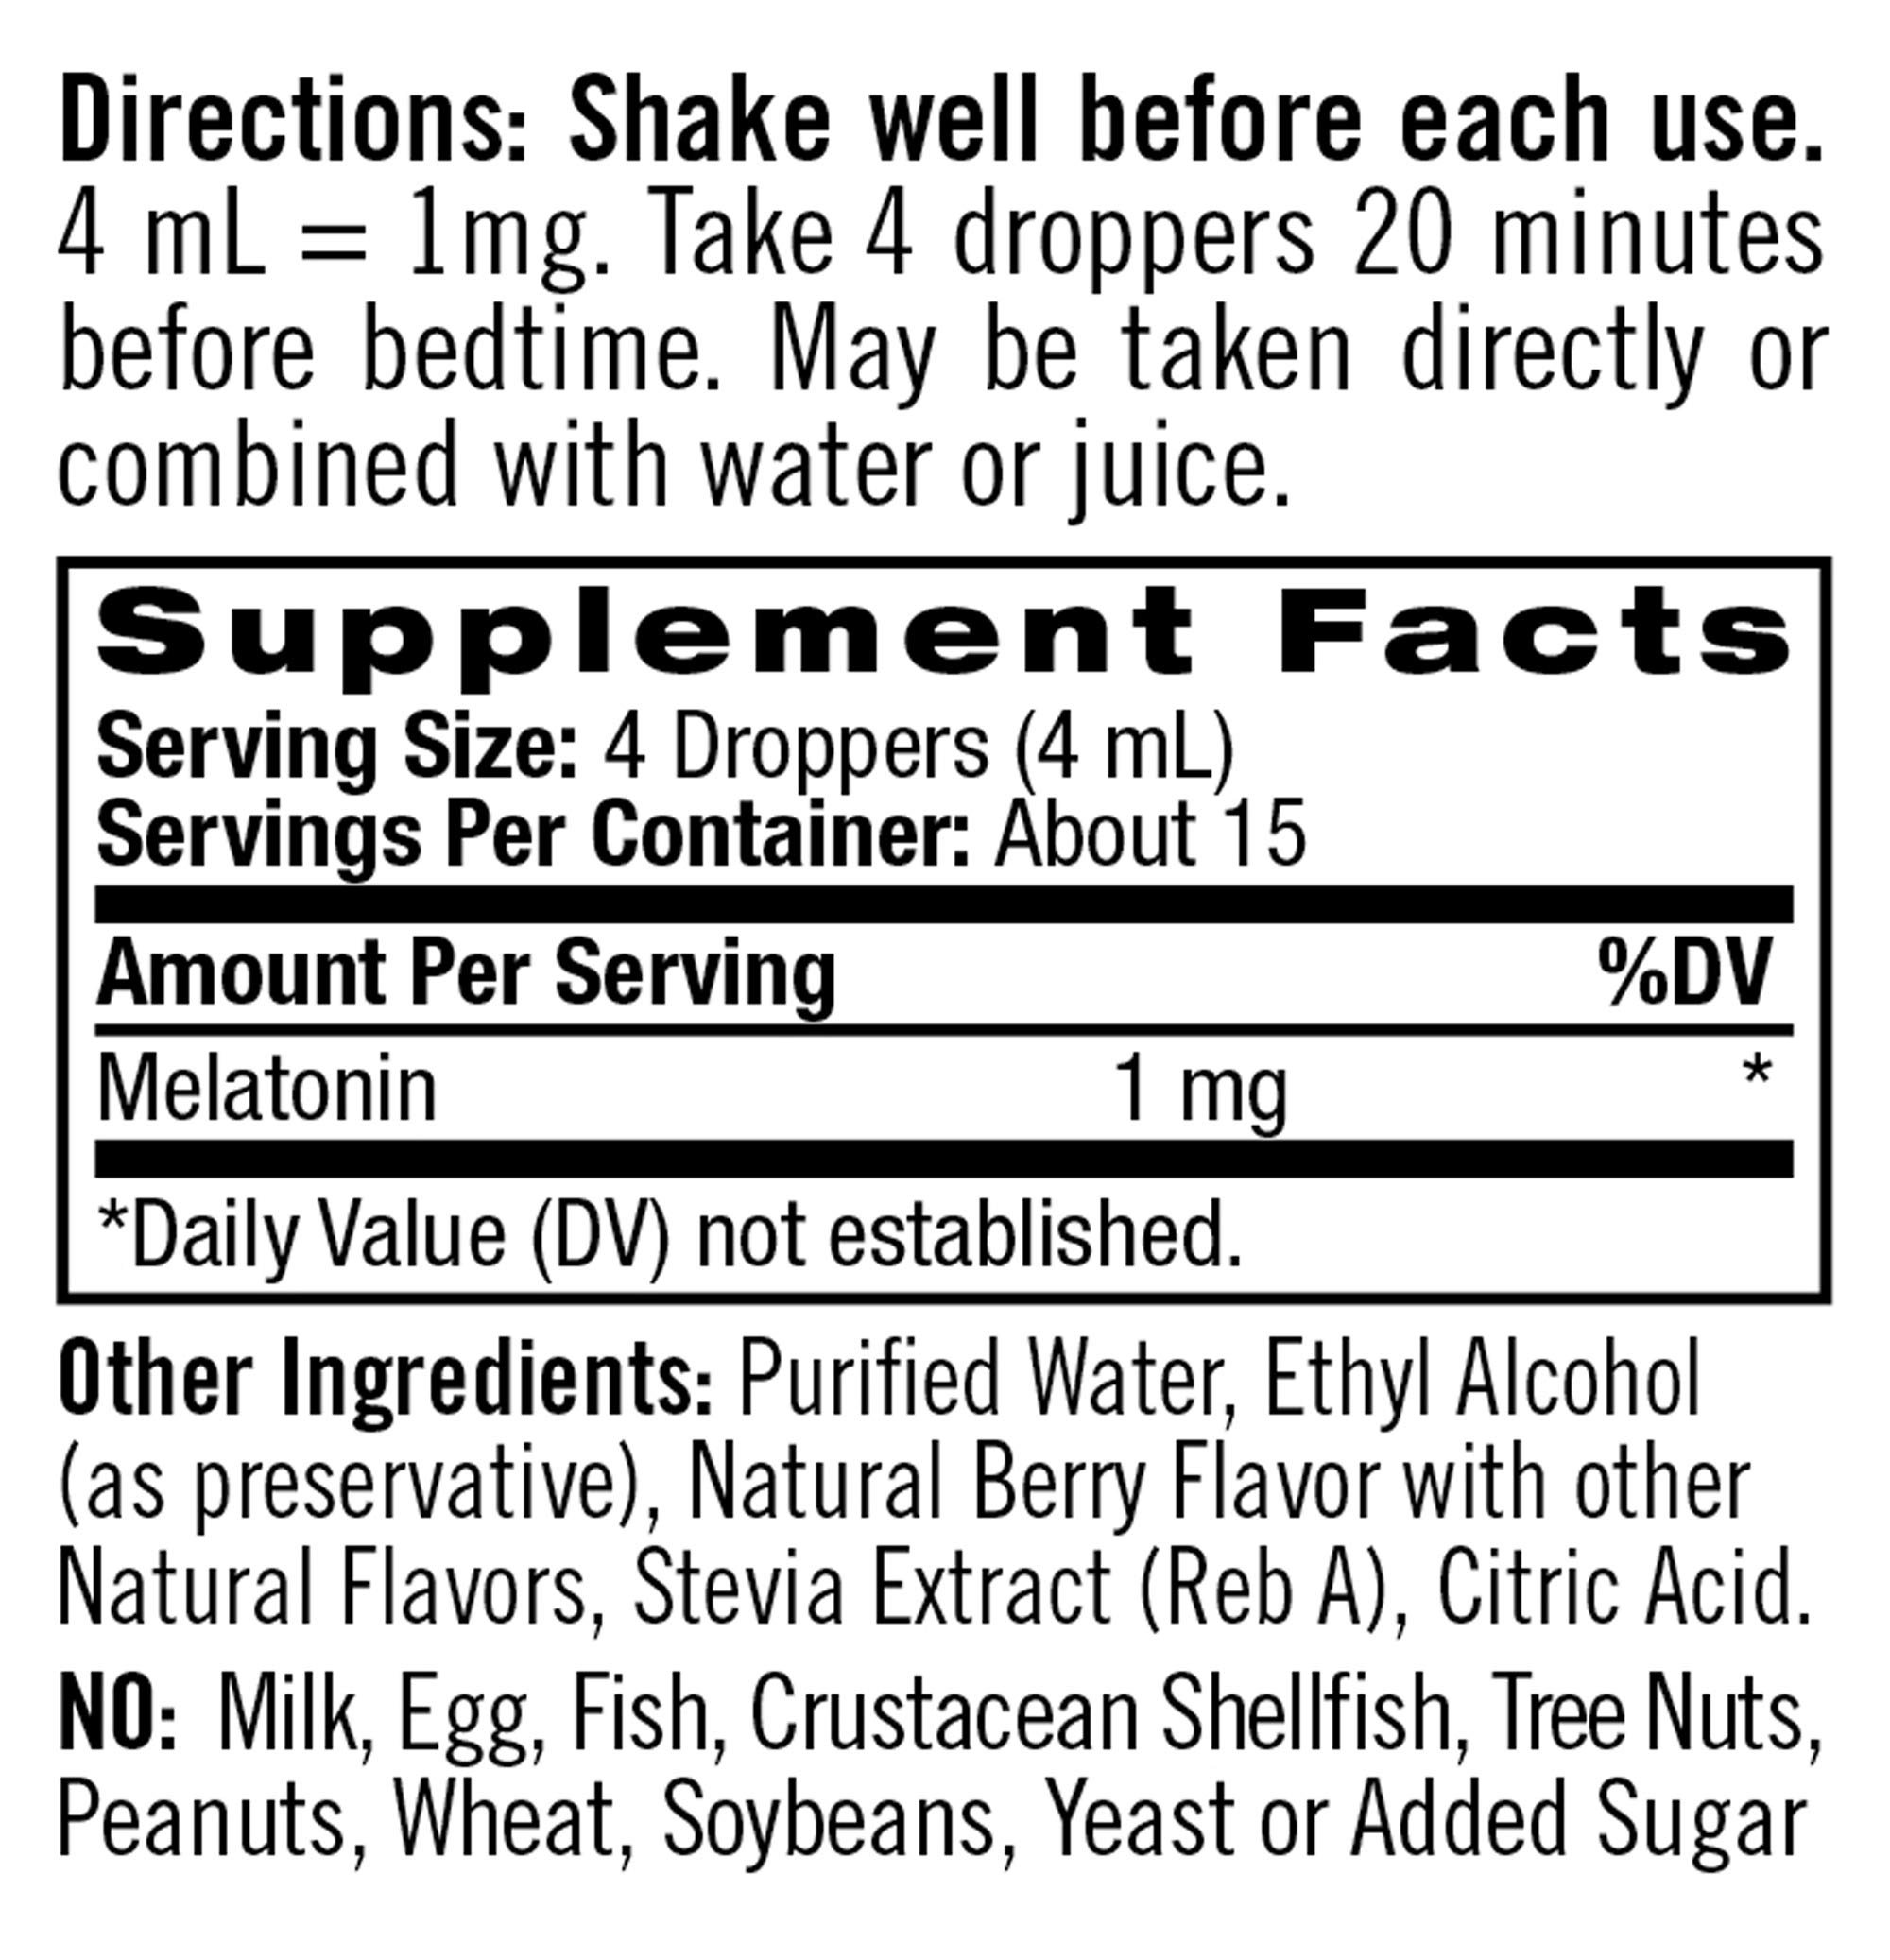 Natrol Liquid Melatonin Tincture, Helps You Fall Asleep Faster, Stay Asleep Longer, Faster Absorption, 100% Vegetarian, Berry Flavor, 1mg, 2 Fl. Ounce Tincture Bottle